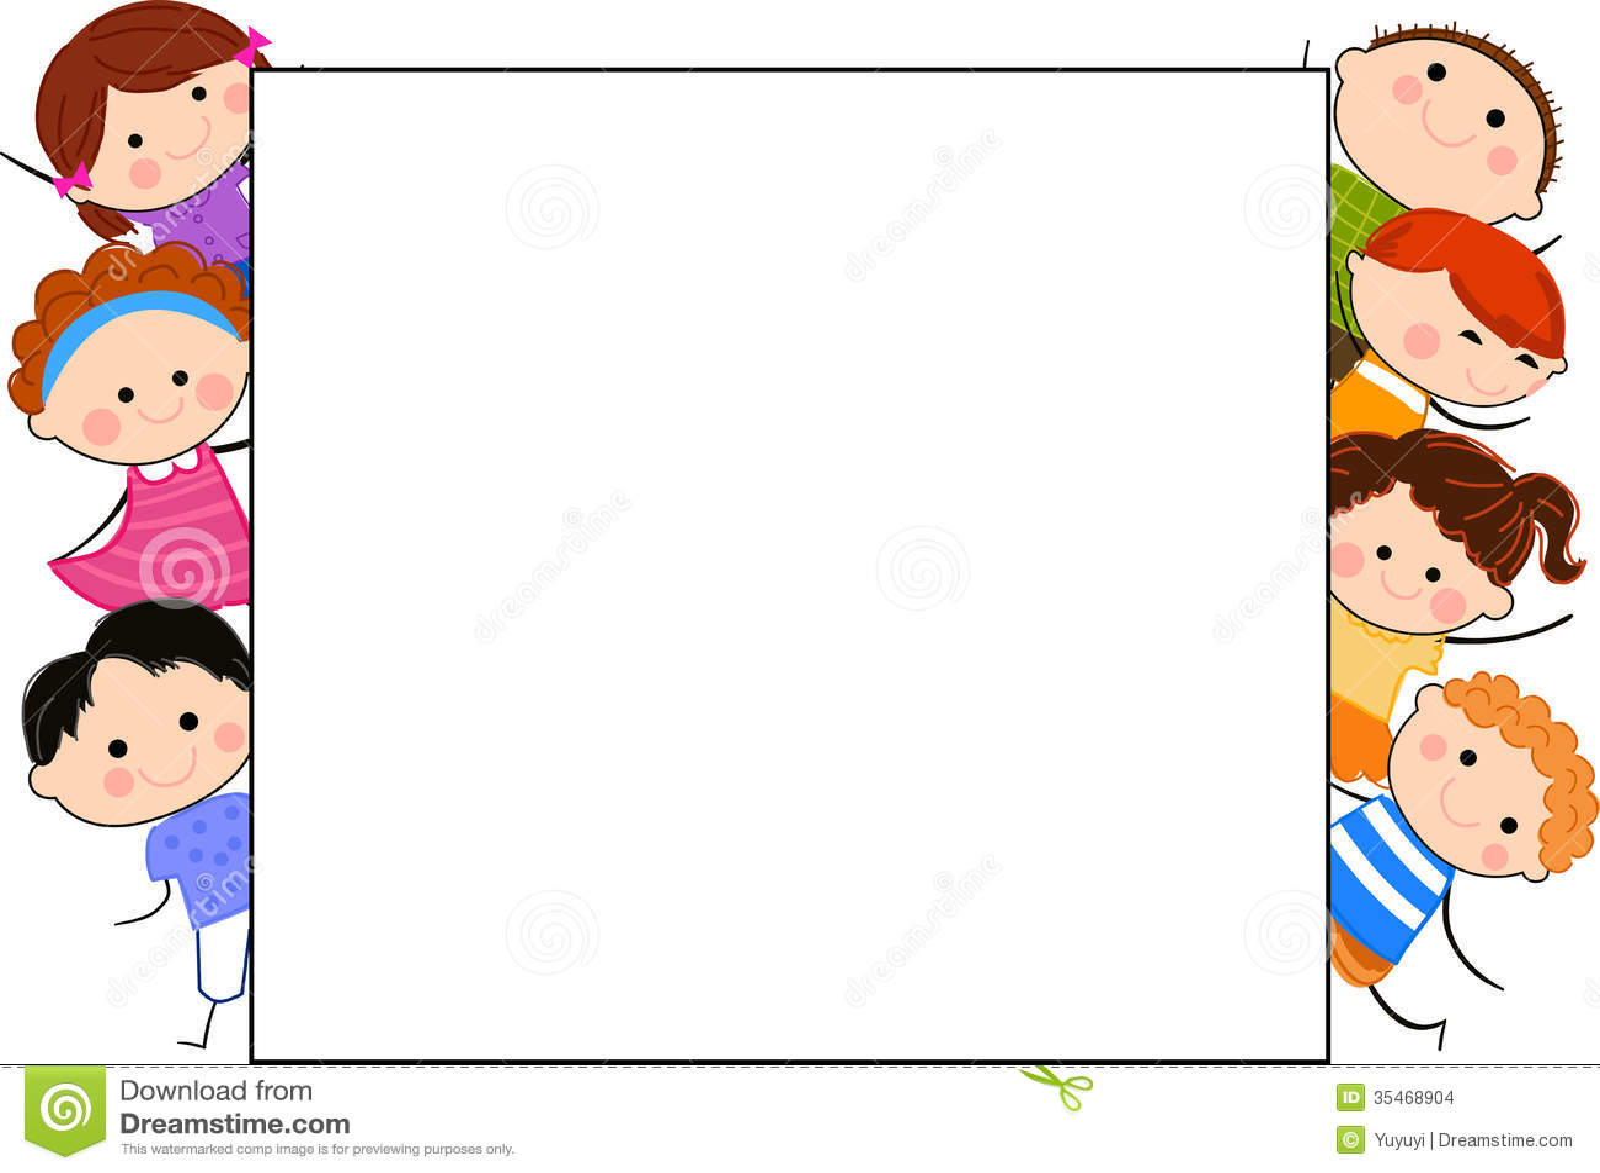 Group of kids and frame stock vector. Illustration of frame - 35468904